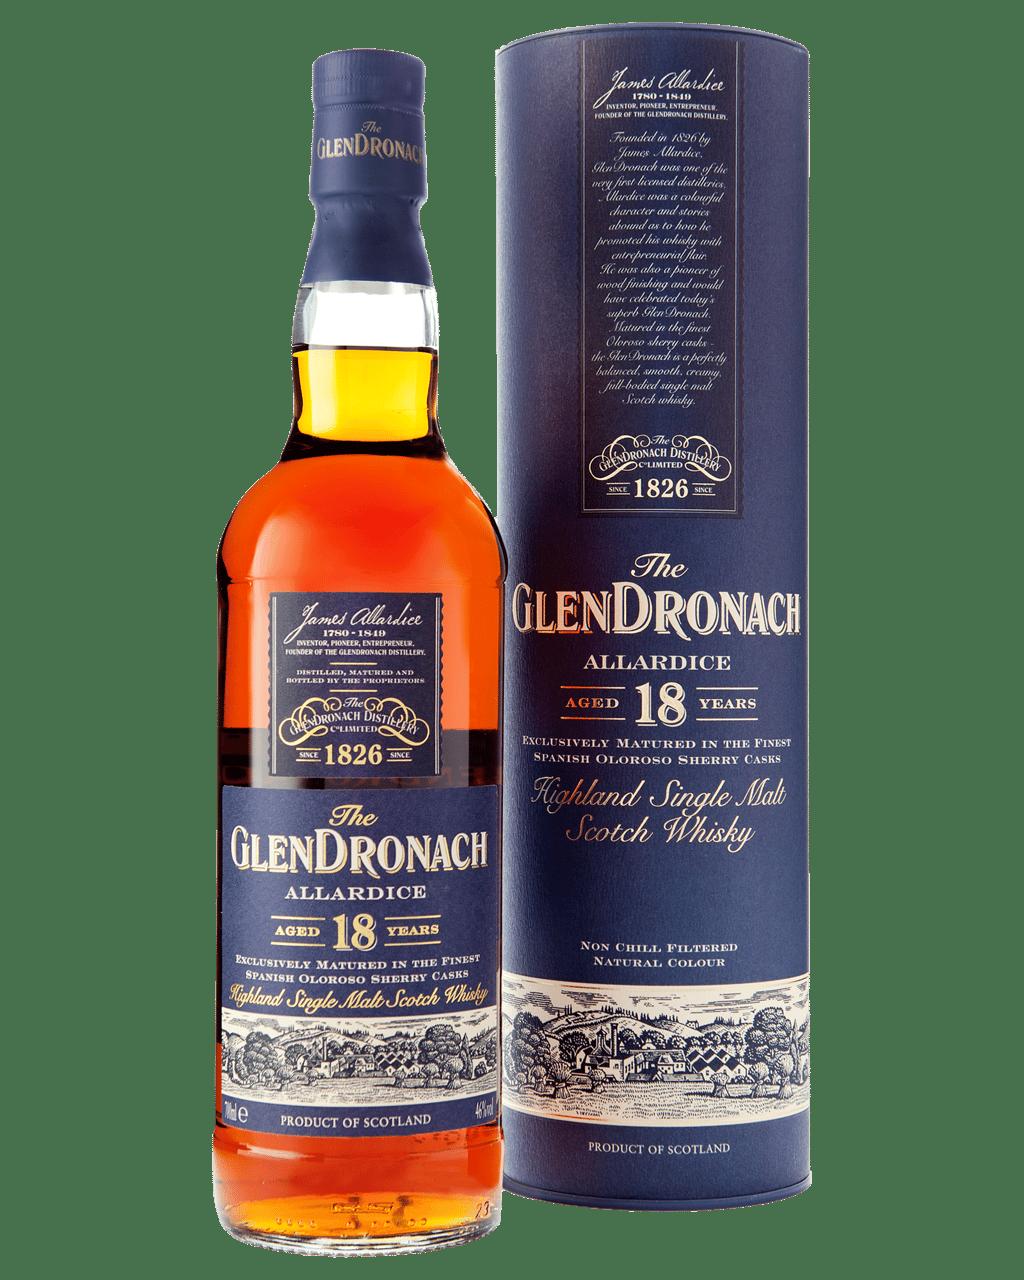 f2681275b42 The GlenDronach 18 Year Old Allardice Single Malt Scotch Whisky 700mL